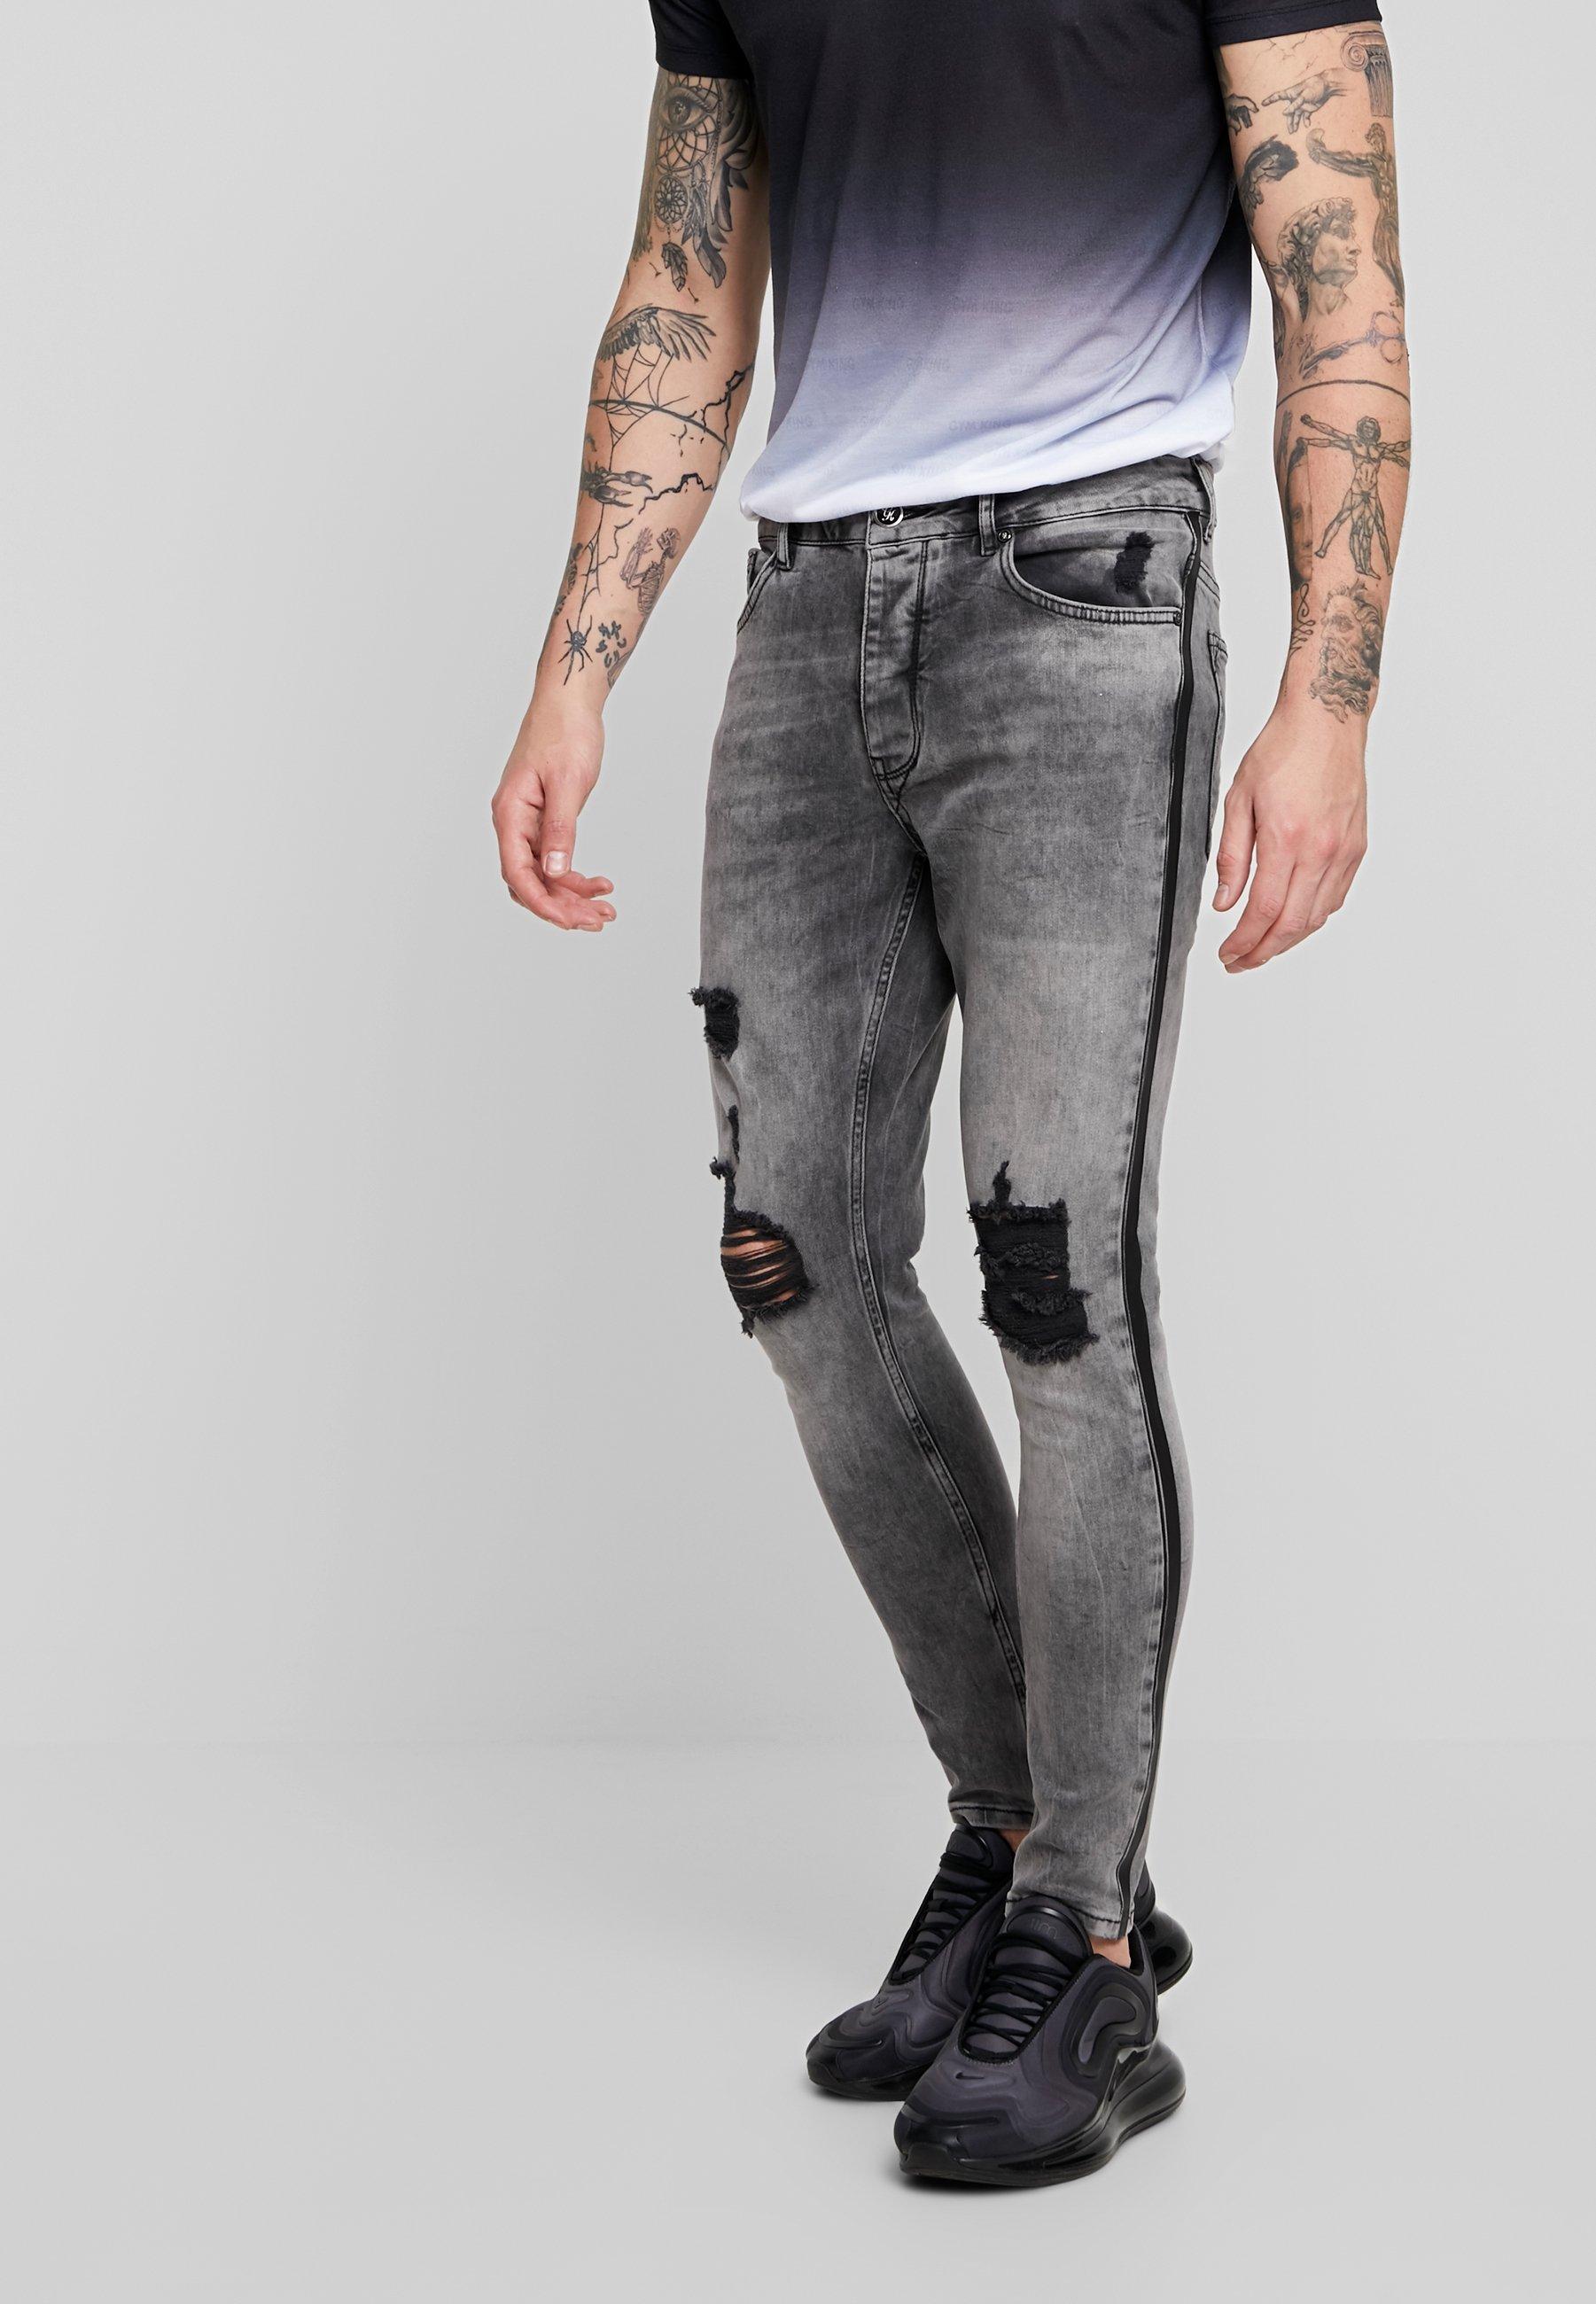 MatersonJeans Skinny King Gym Gym King Skinny MatersonJeans Grey 5LRq43Aj